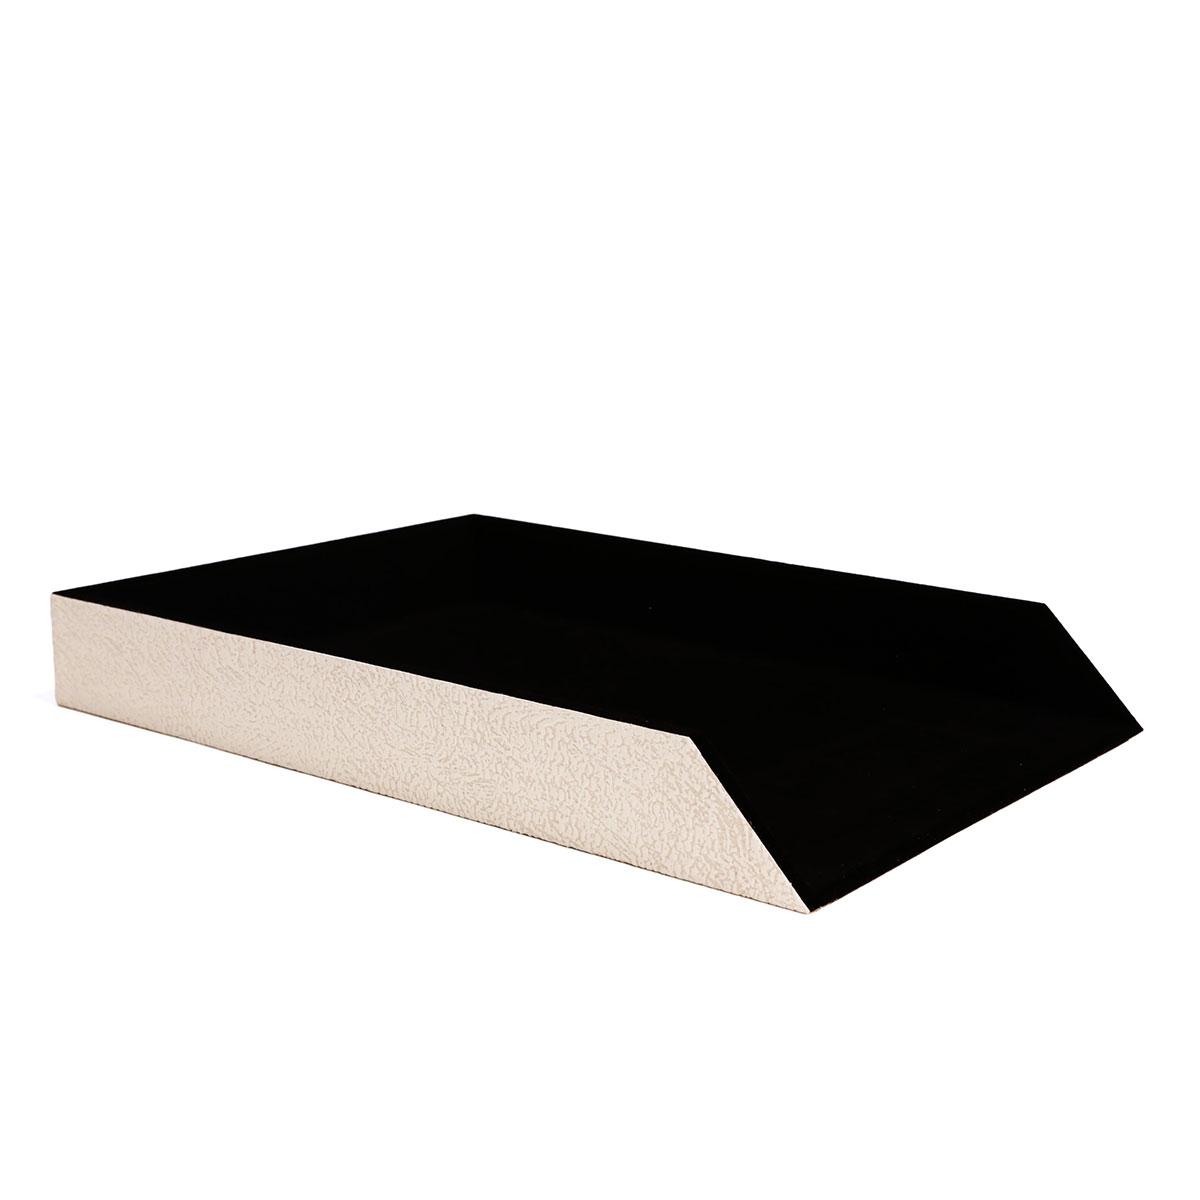 Caixa porta papel A4 (Savana Off White)